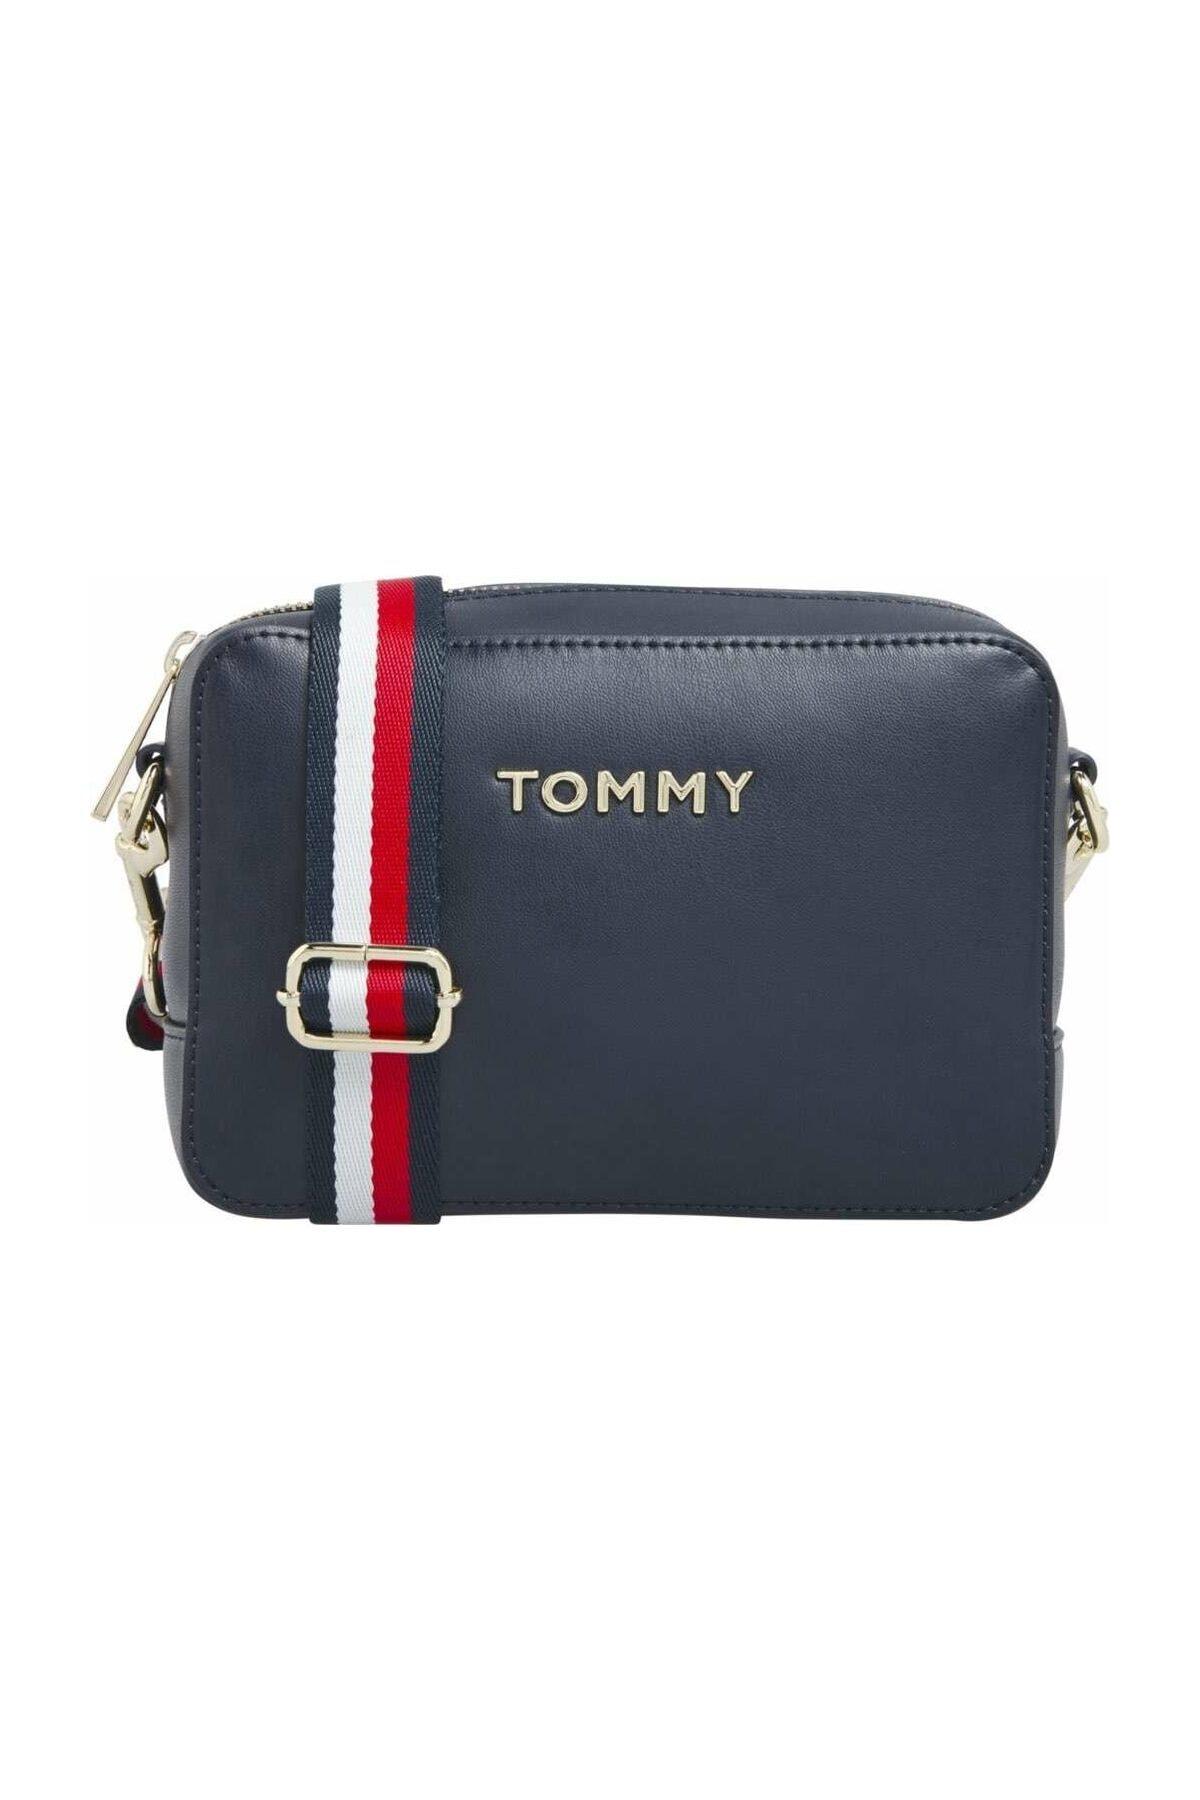 Tommy Hilfiger Kadın Mavi Omuz Çantası Iconıc Tommy Camera Bag AW0AW08608 1